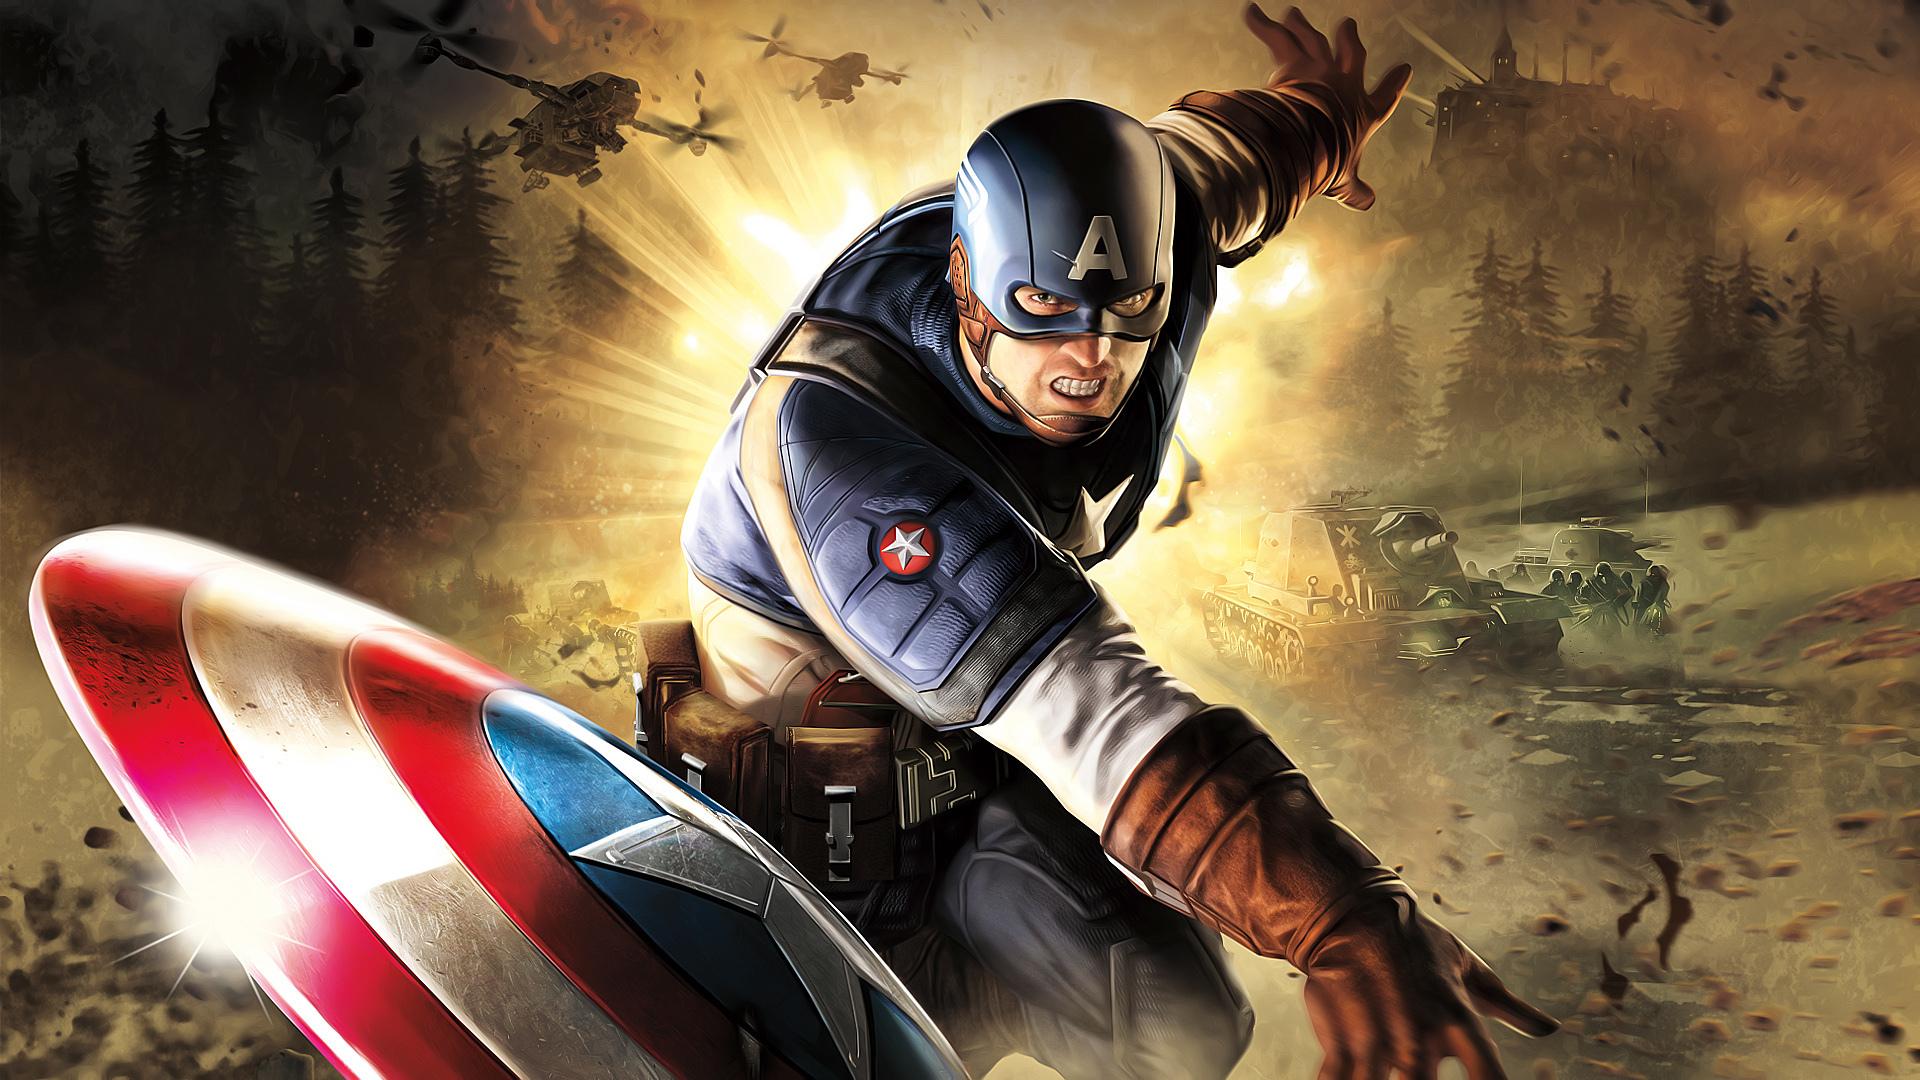 Captain America Hd Wallpaper Sf Wallpaper